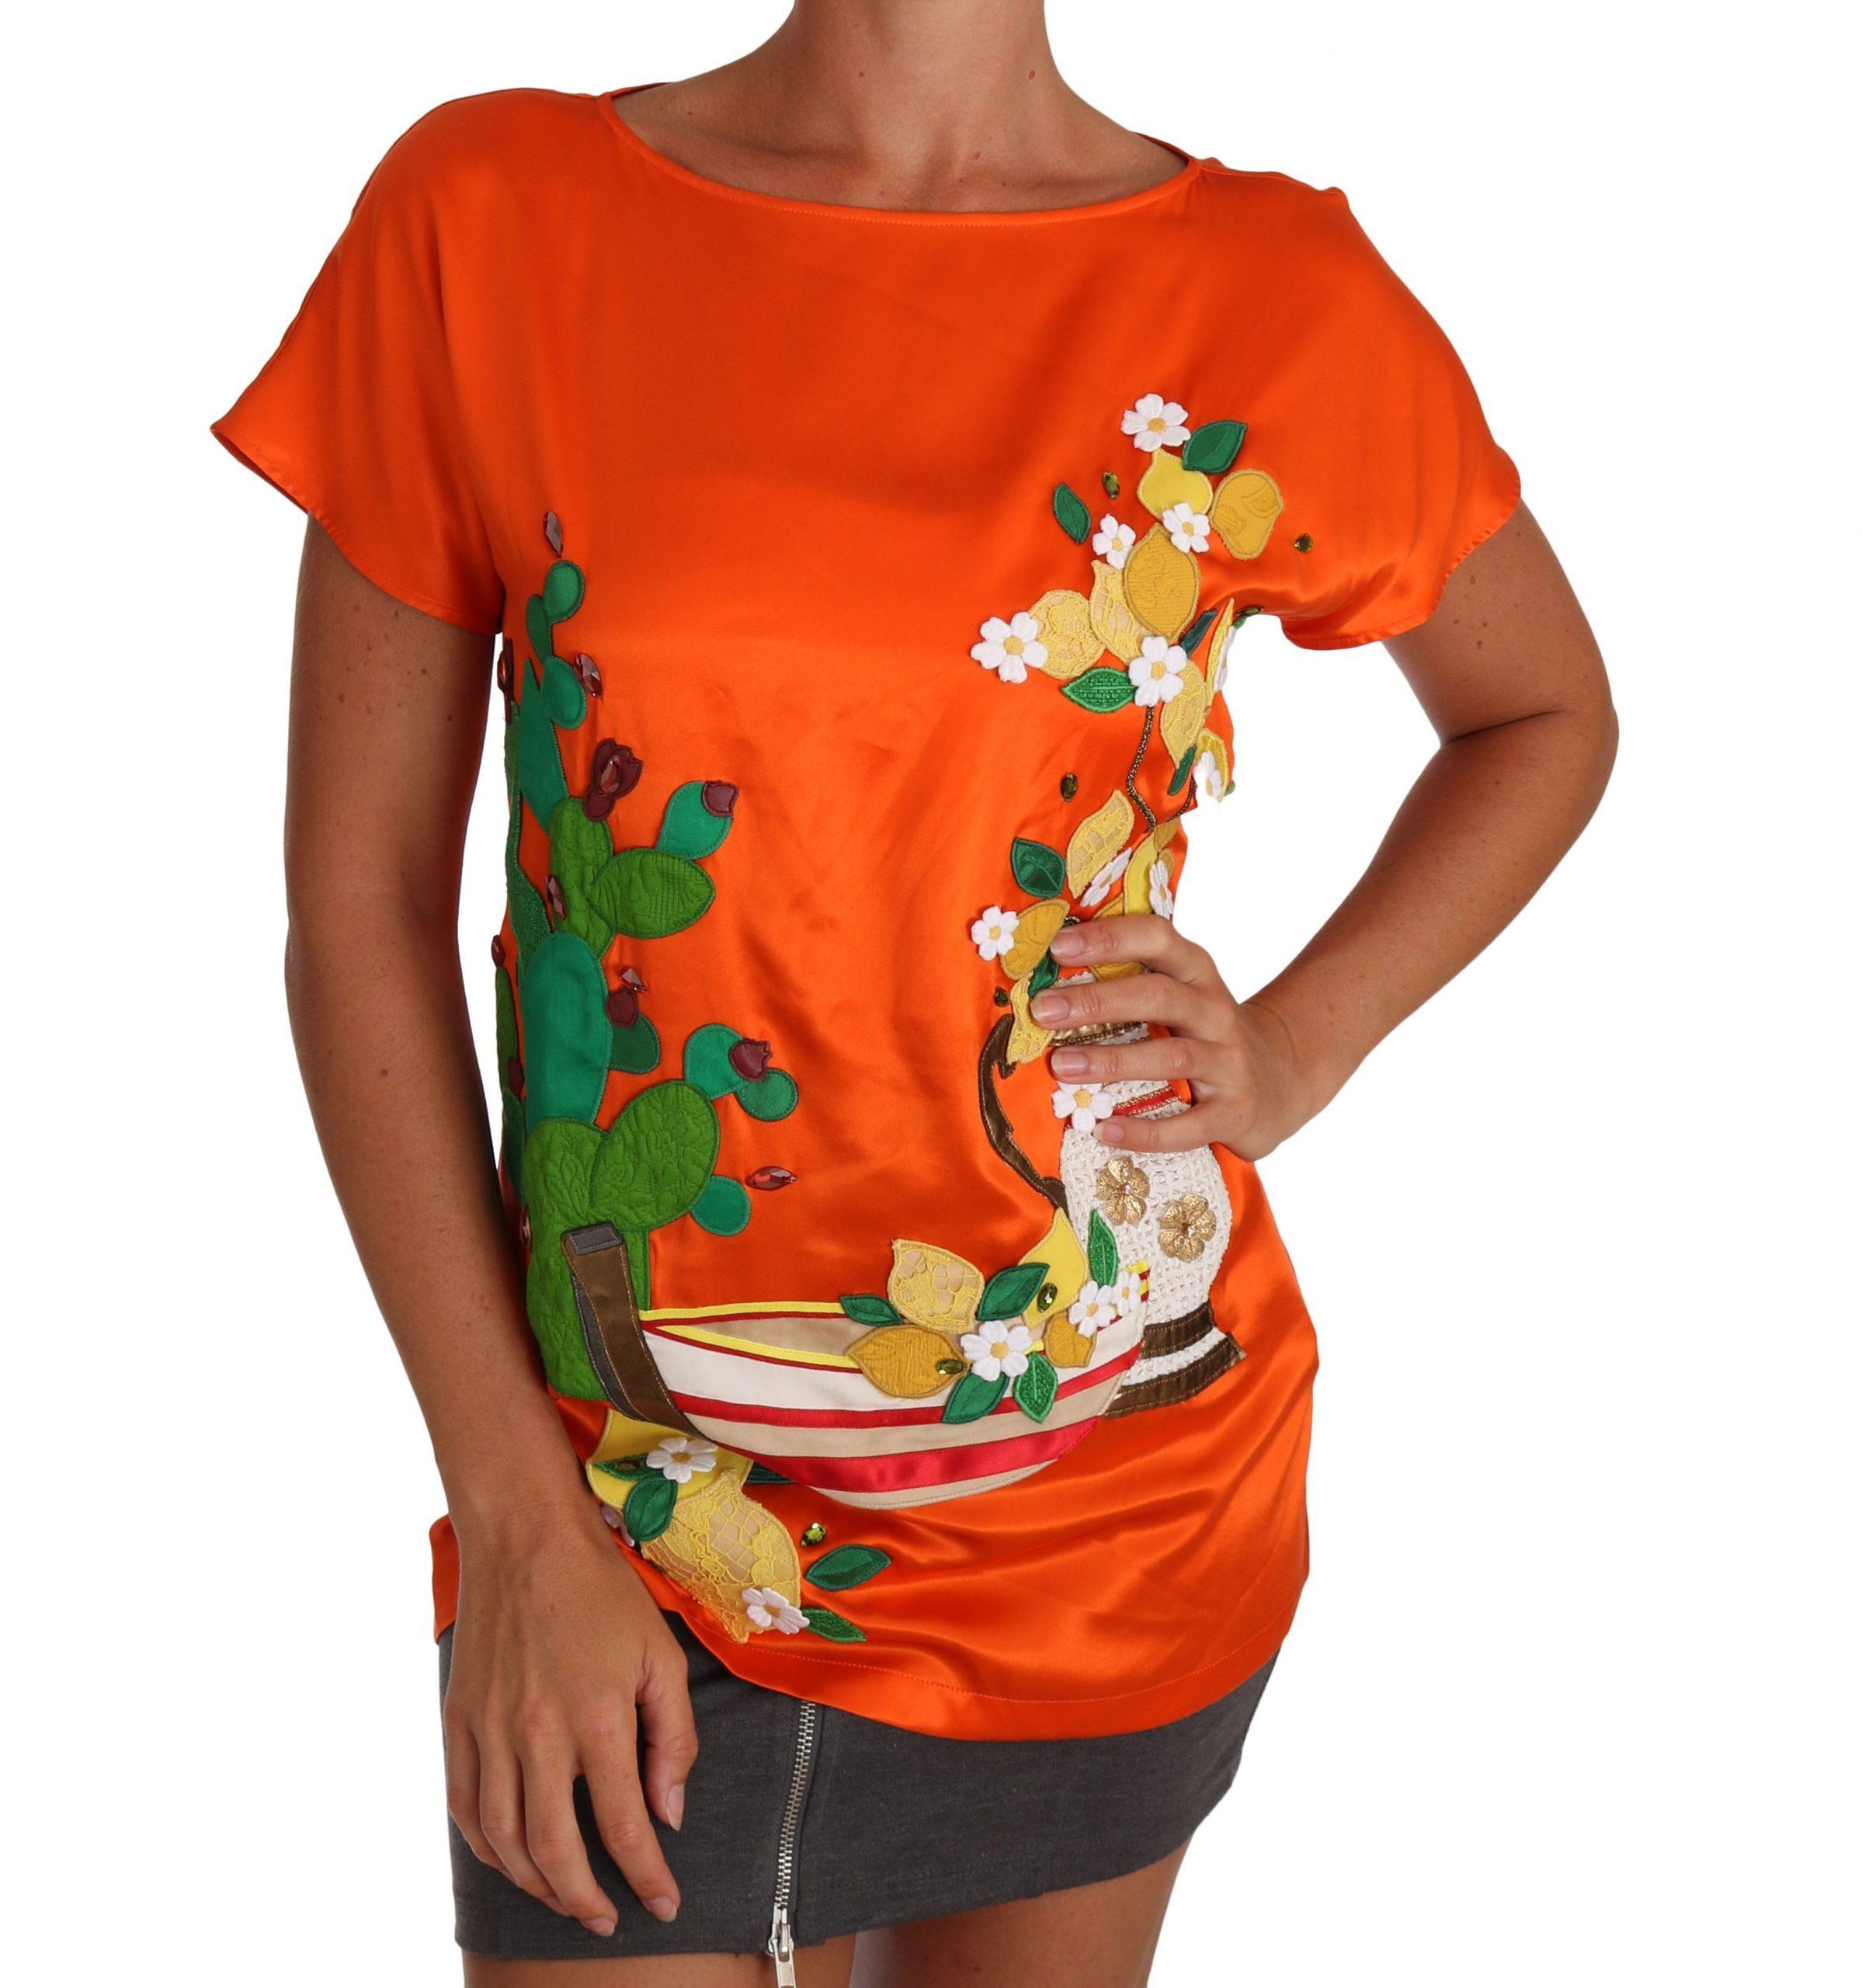 Dolce & Gabbana Women's Sicily Crystal T-Shirts Orange TSH2381 - IT36 | XS